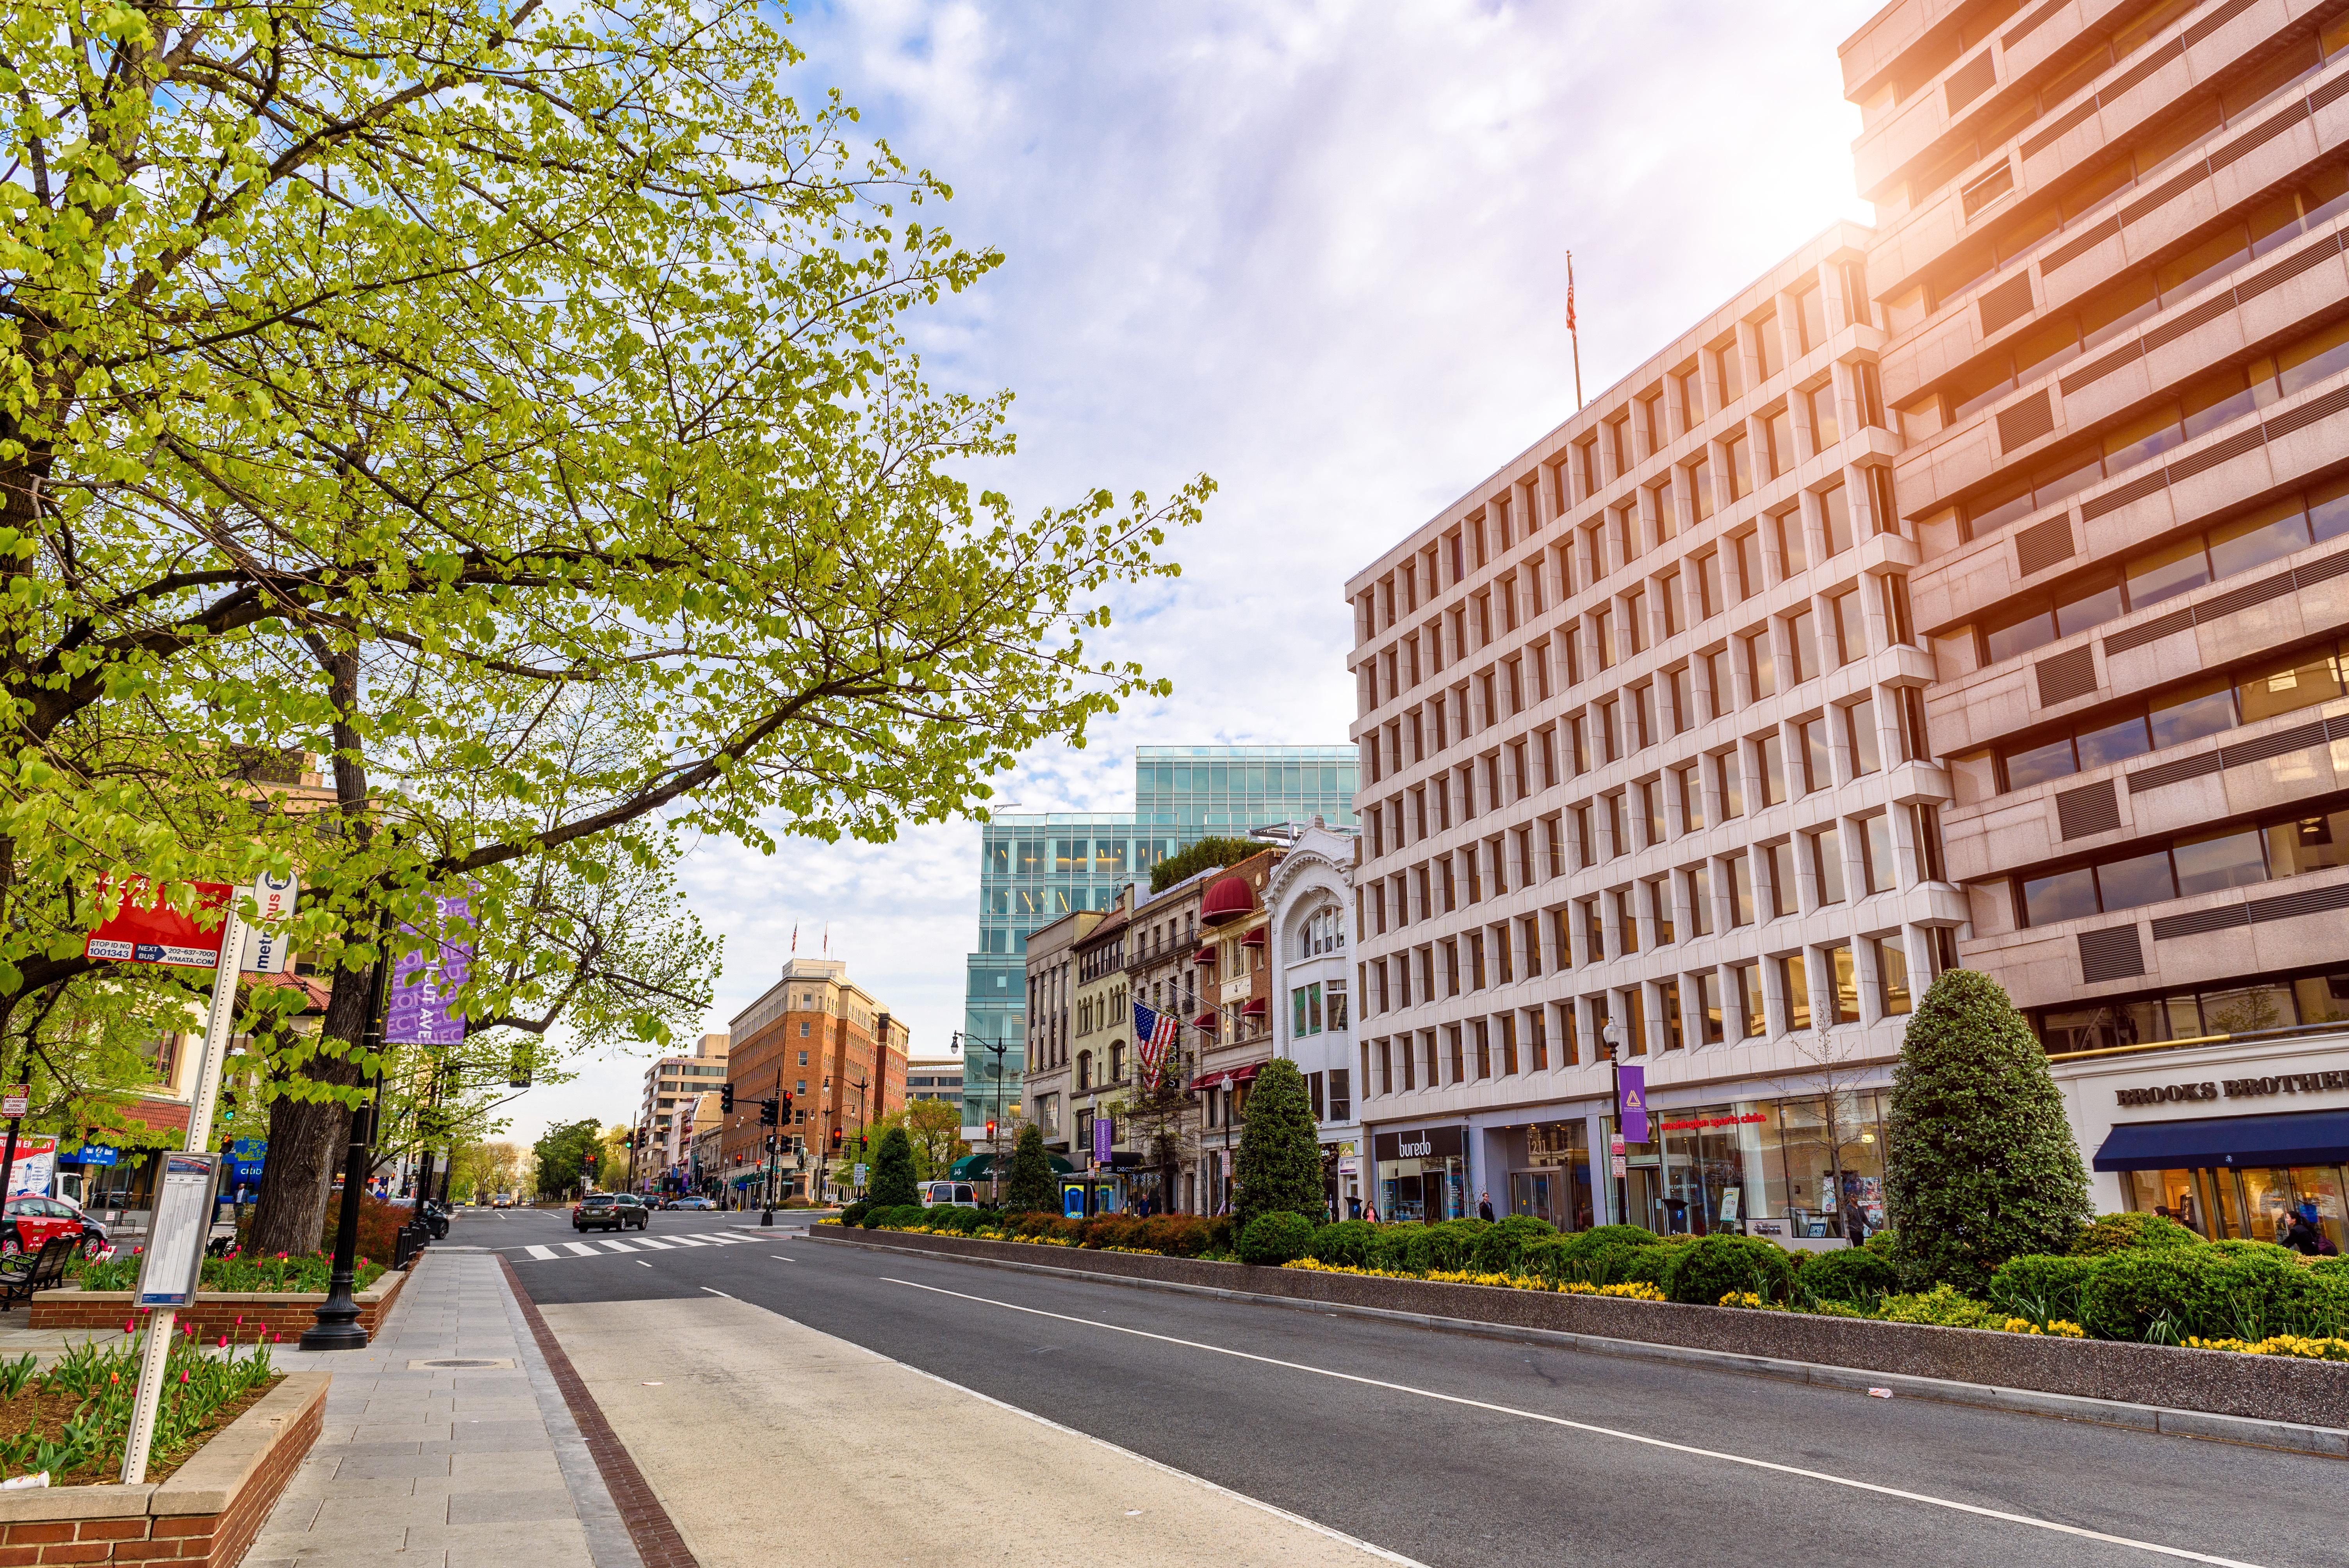 Heralding spring, haiku signs pop up across part of Northwest D.C.